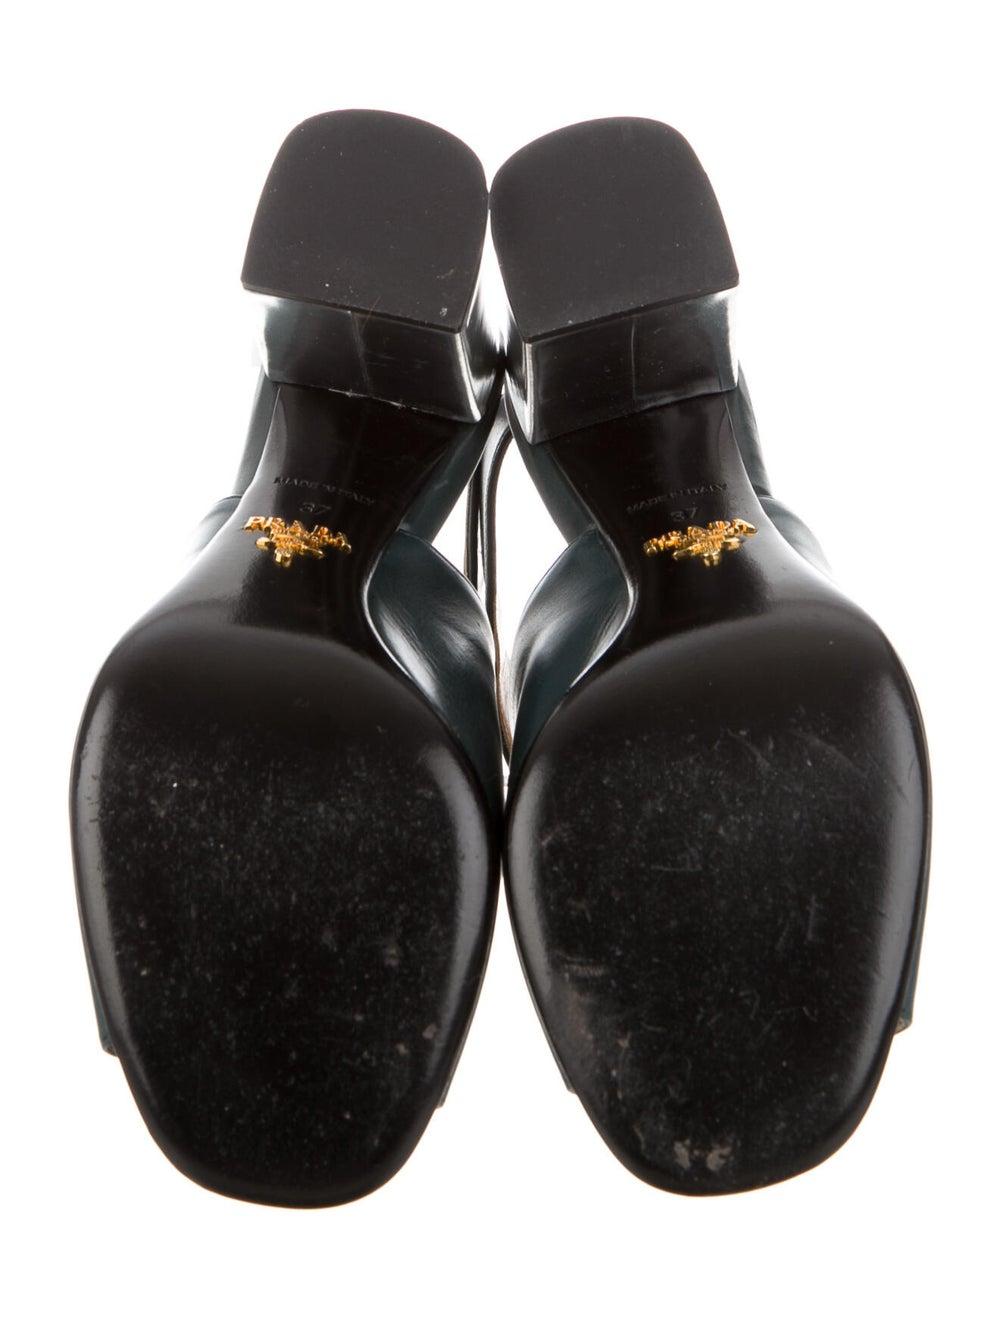 Prada Leather Boots Green - image 5